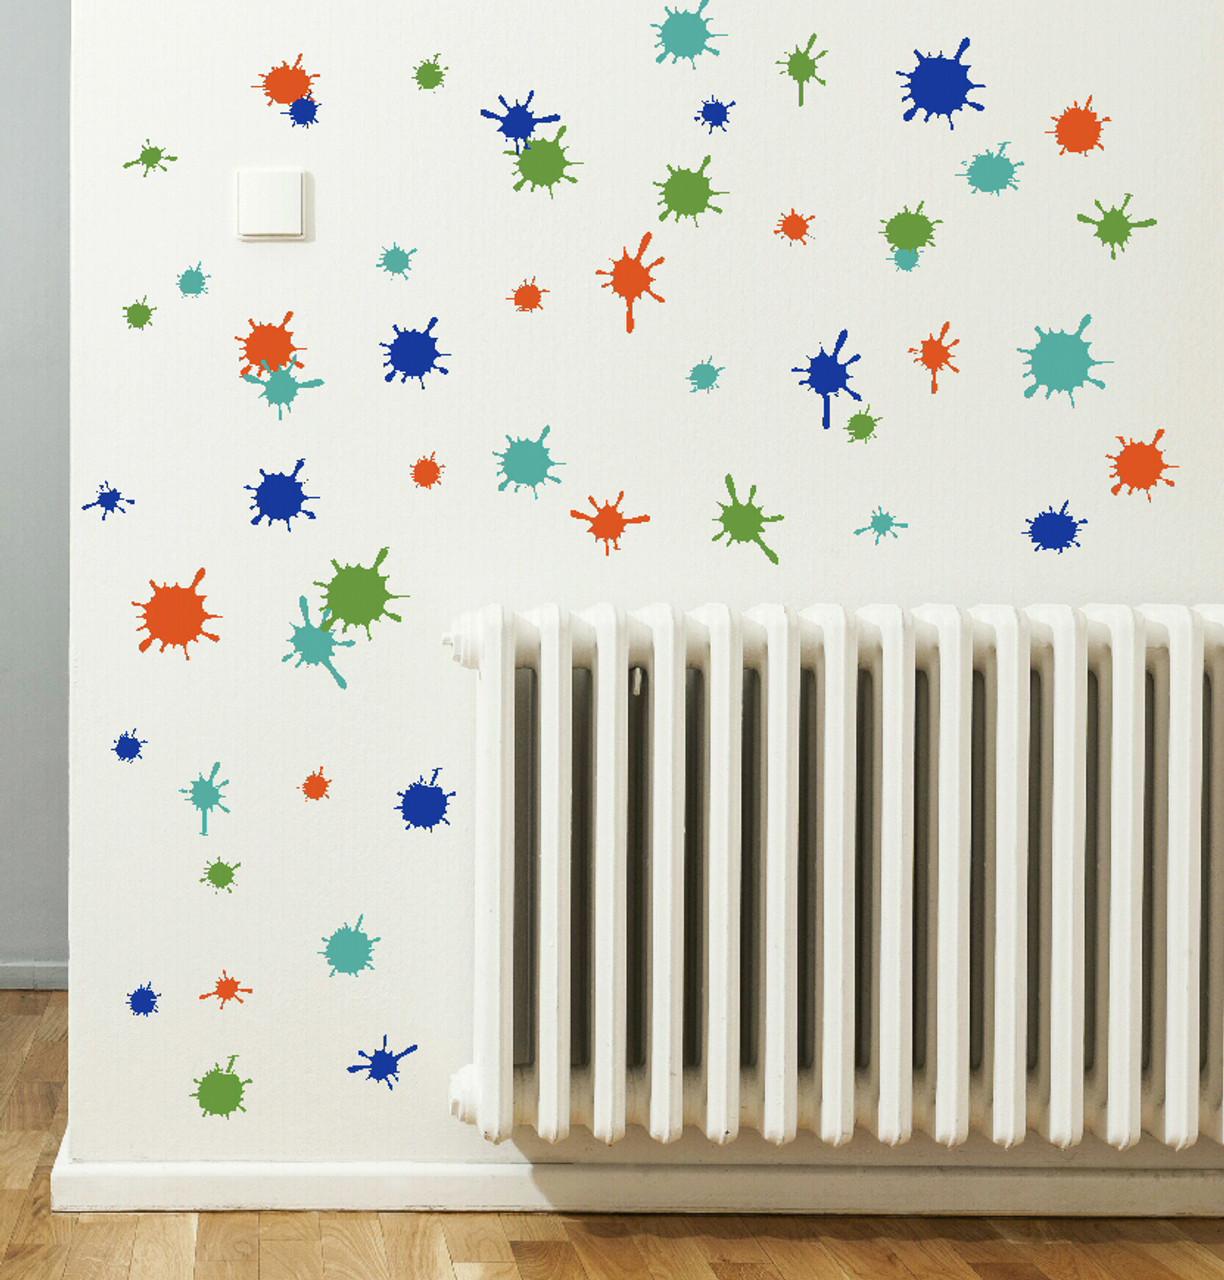 splatter and splotches wall art vinyl stickers easy room decor, 13pc